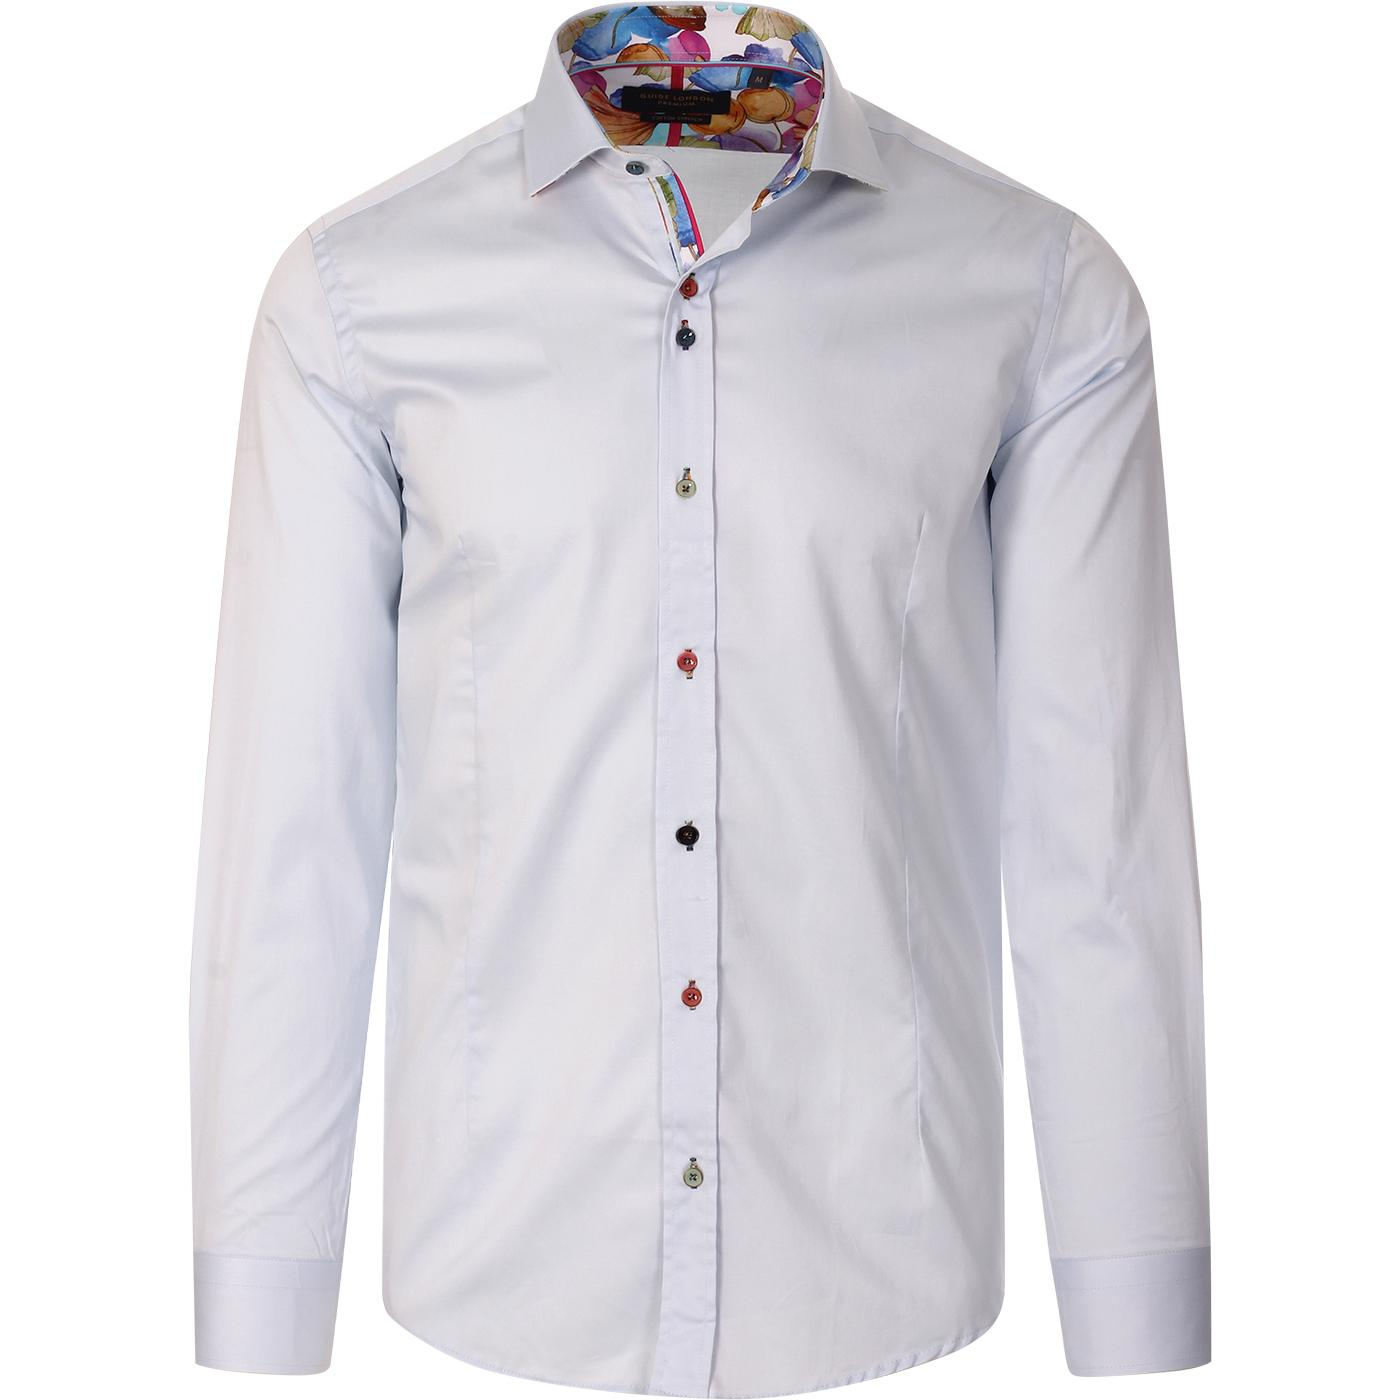 GUIDE LONDON Multi Colour Button Smart Shirt (SB)